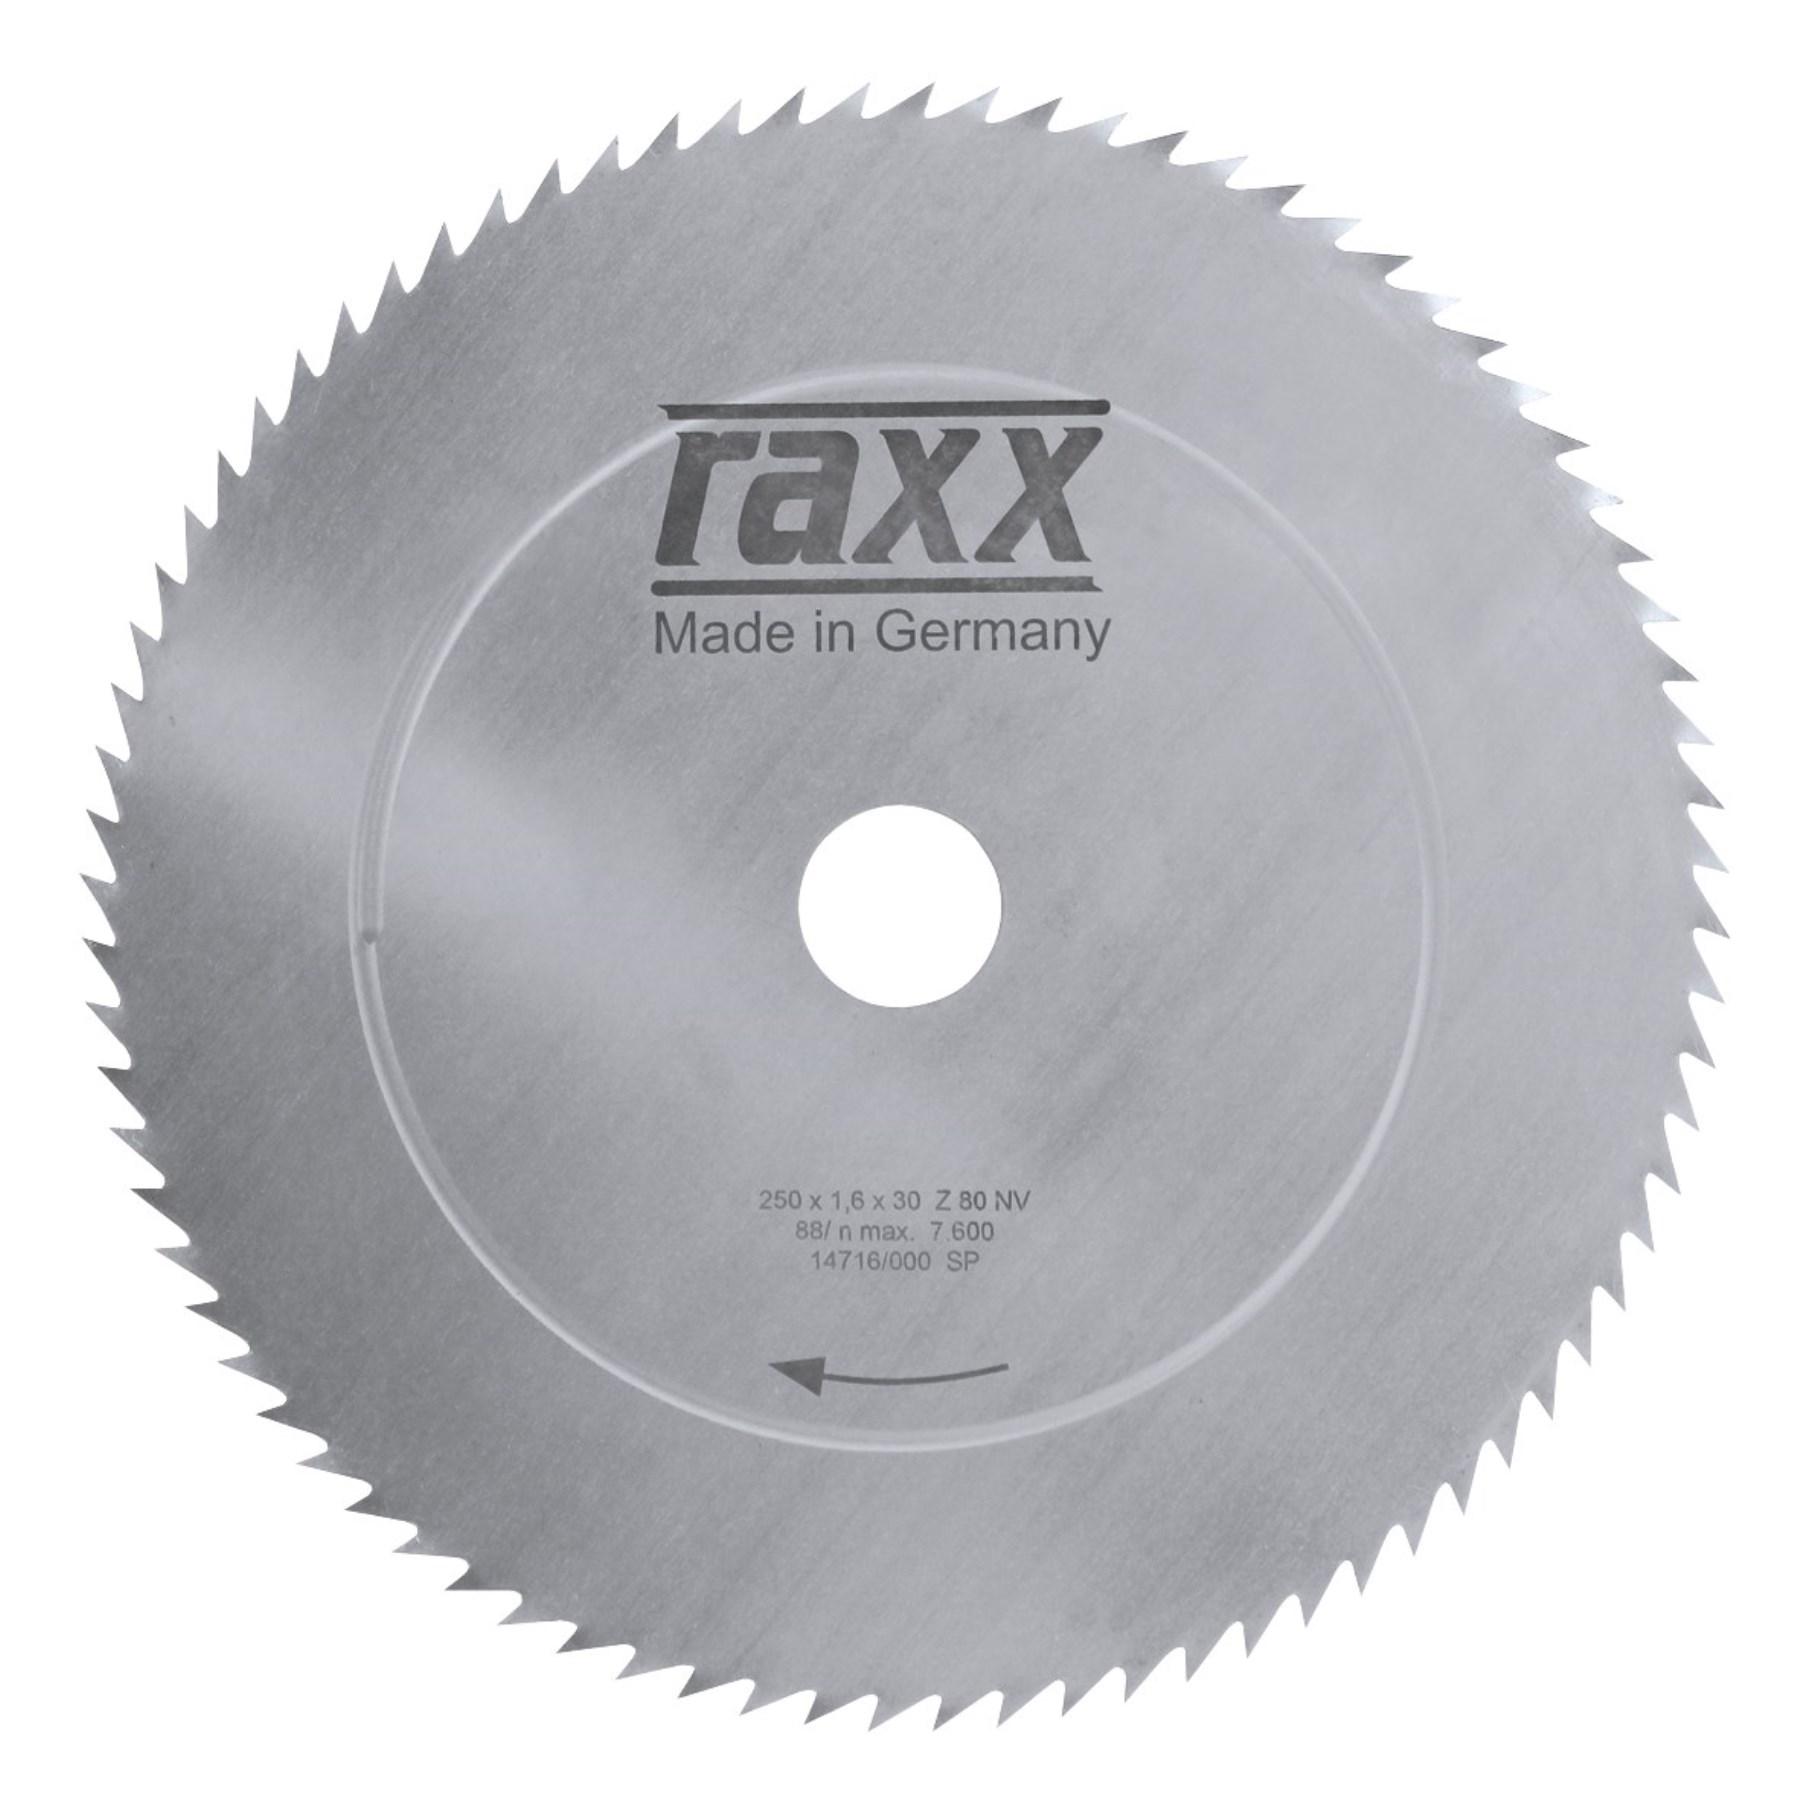 RAXX 1205037 kotouč k okružní pile 400x2,0x30 [ 7300300800060410 ]